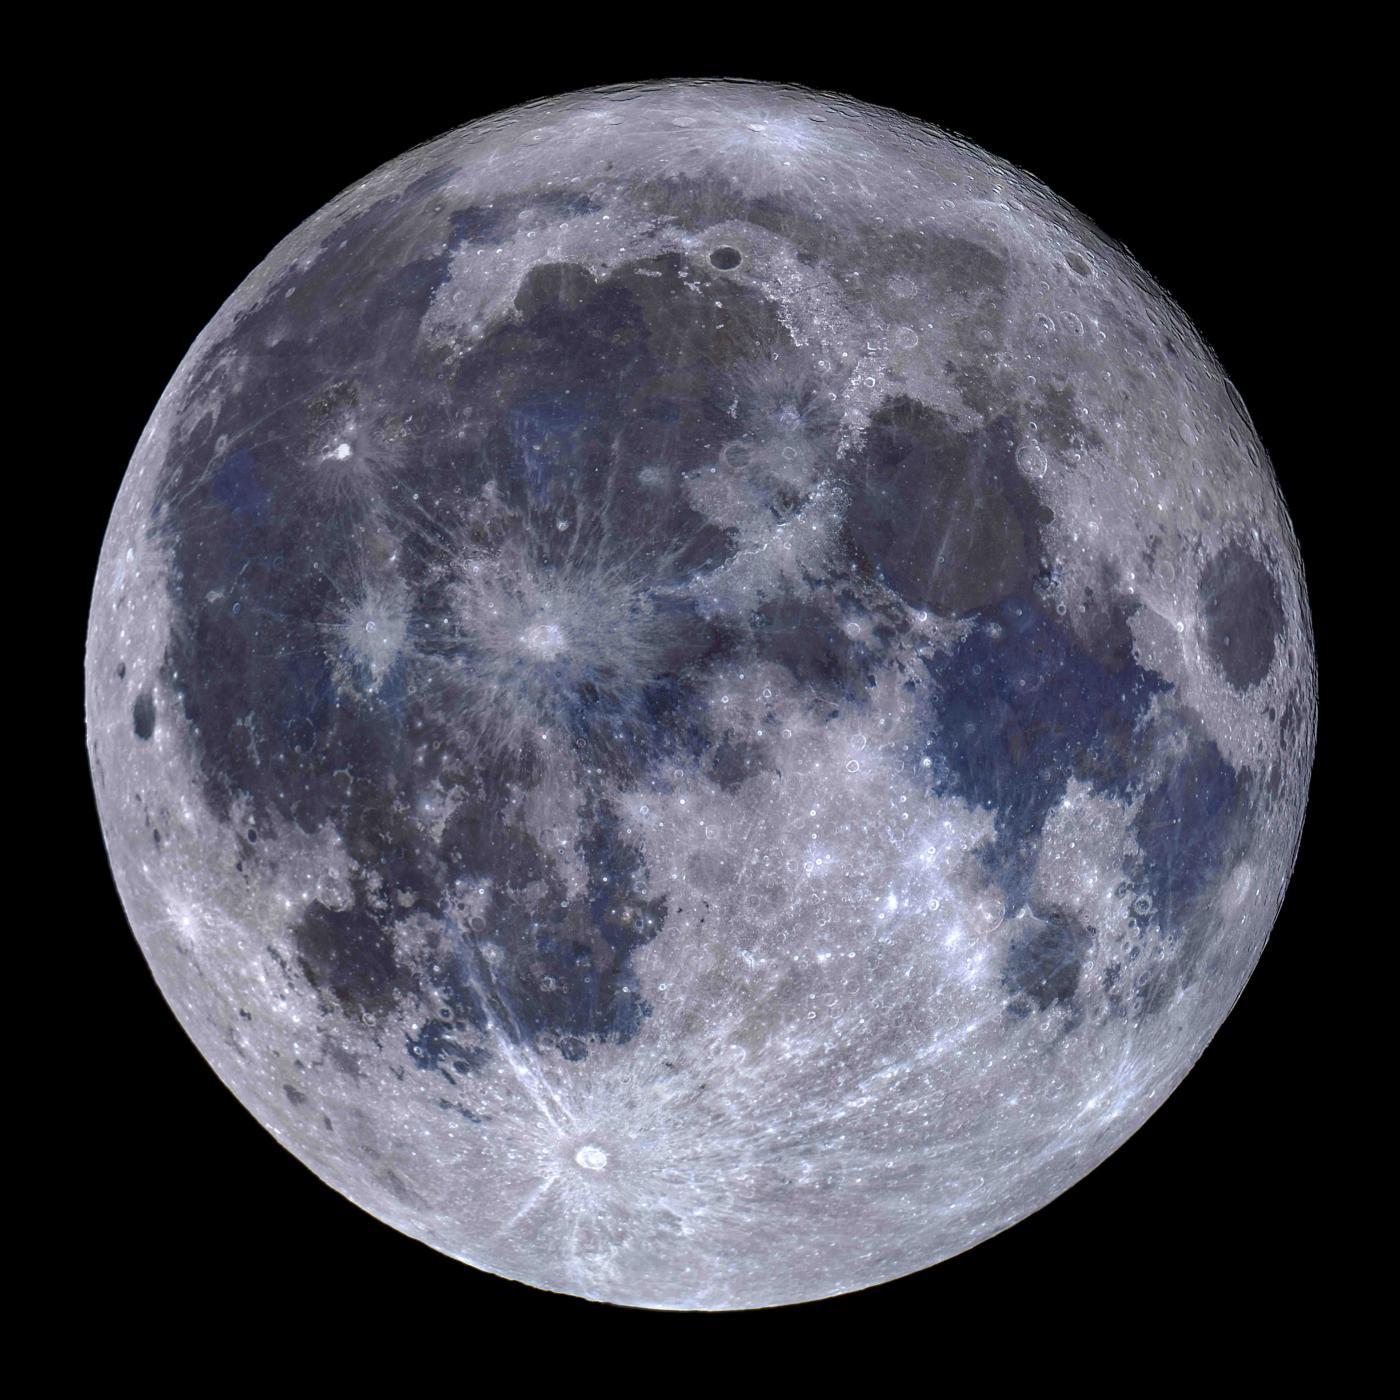 An image showing 'A Titanium Moon'